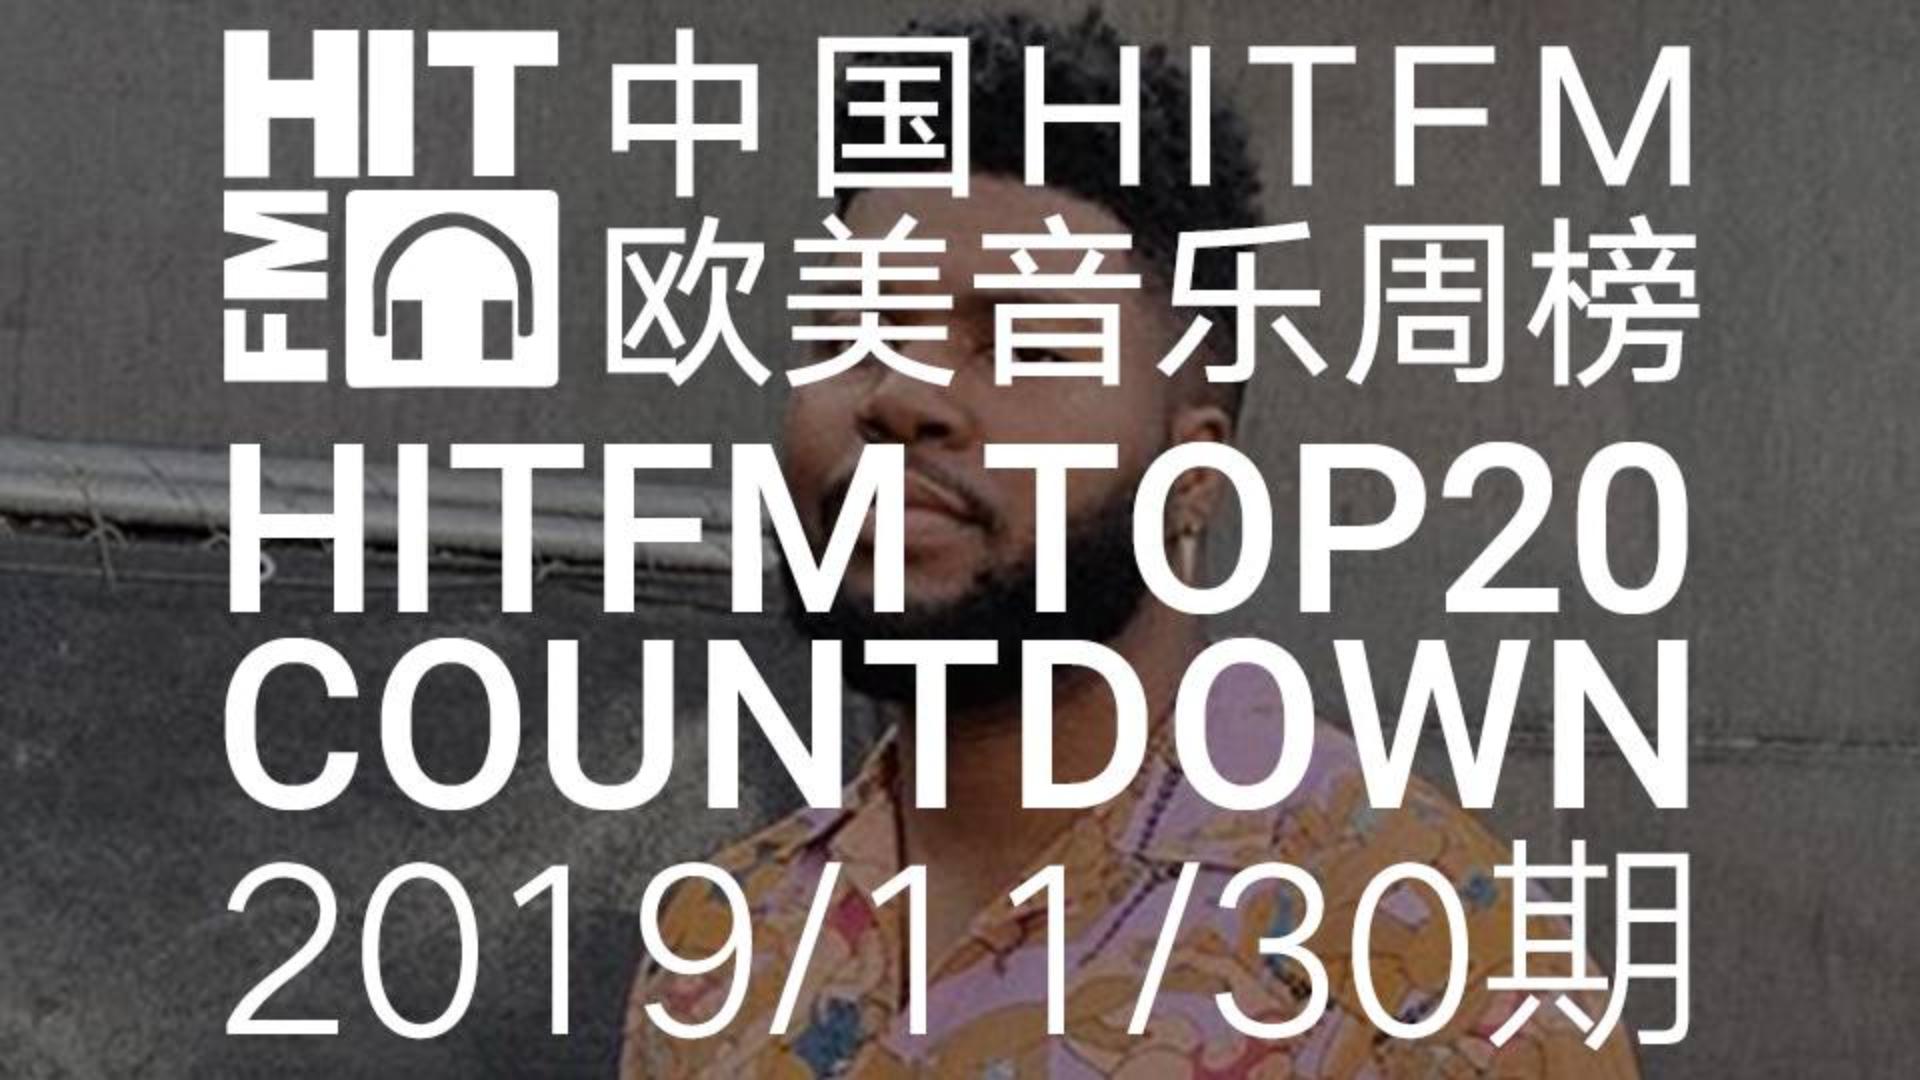 【HITFM】中国HITFM欧美音乐周榜HITFM TOP20 Countdown 20191130